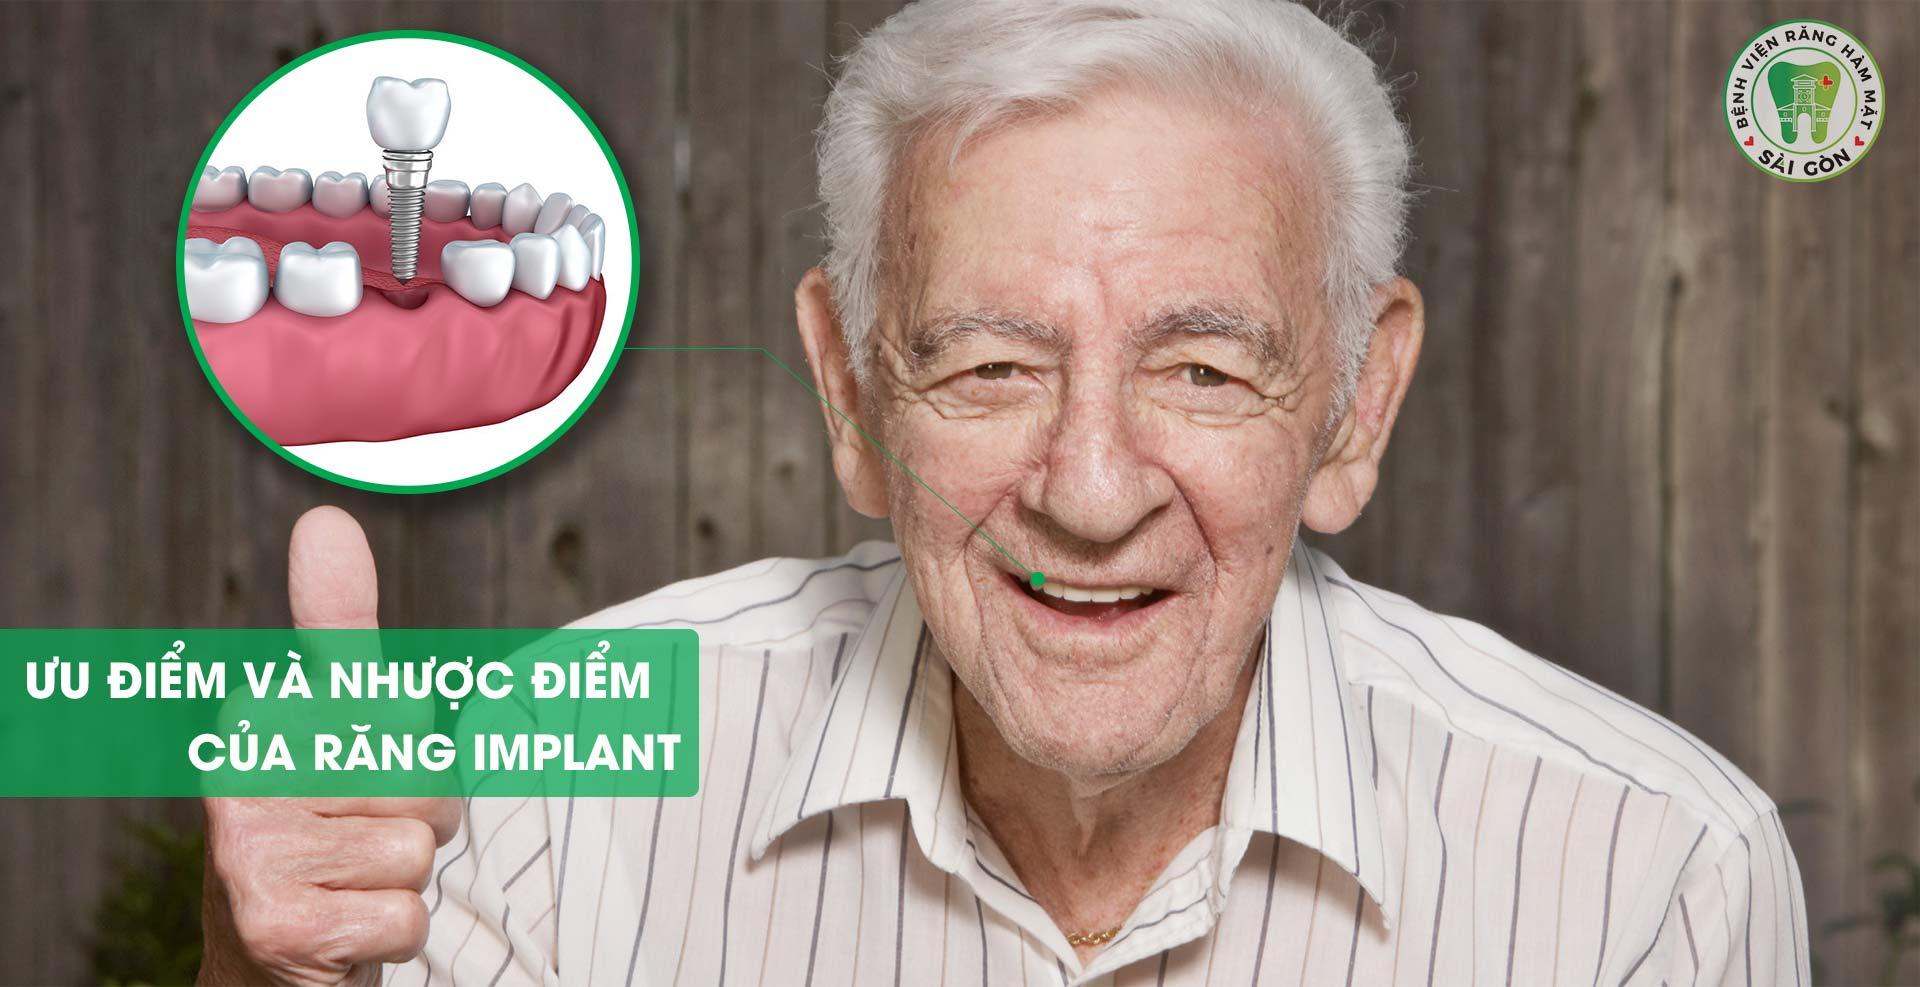 uu-diem-cua-rang-implant